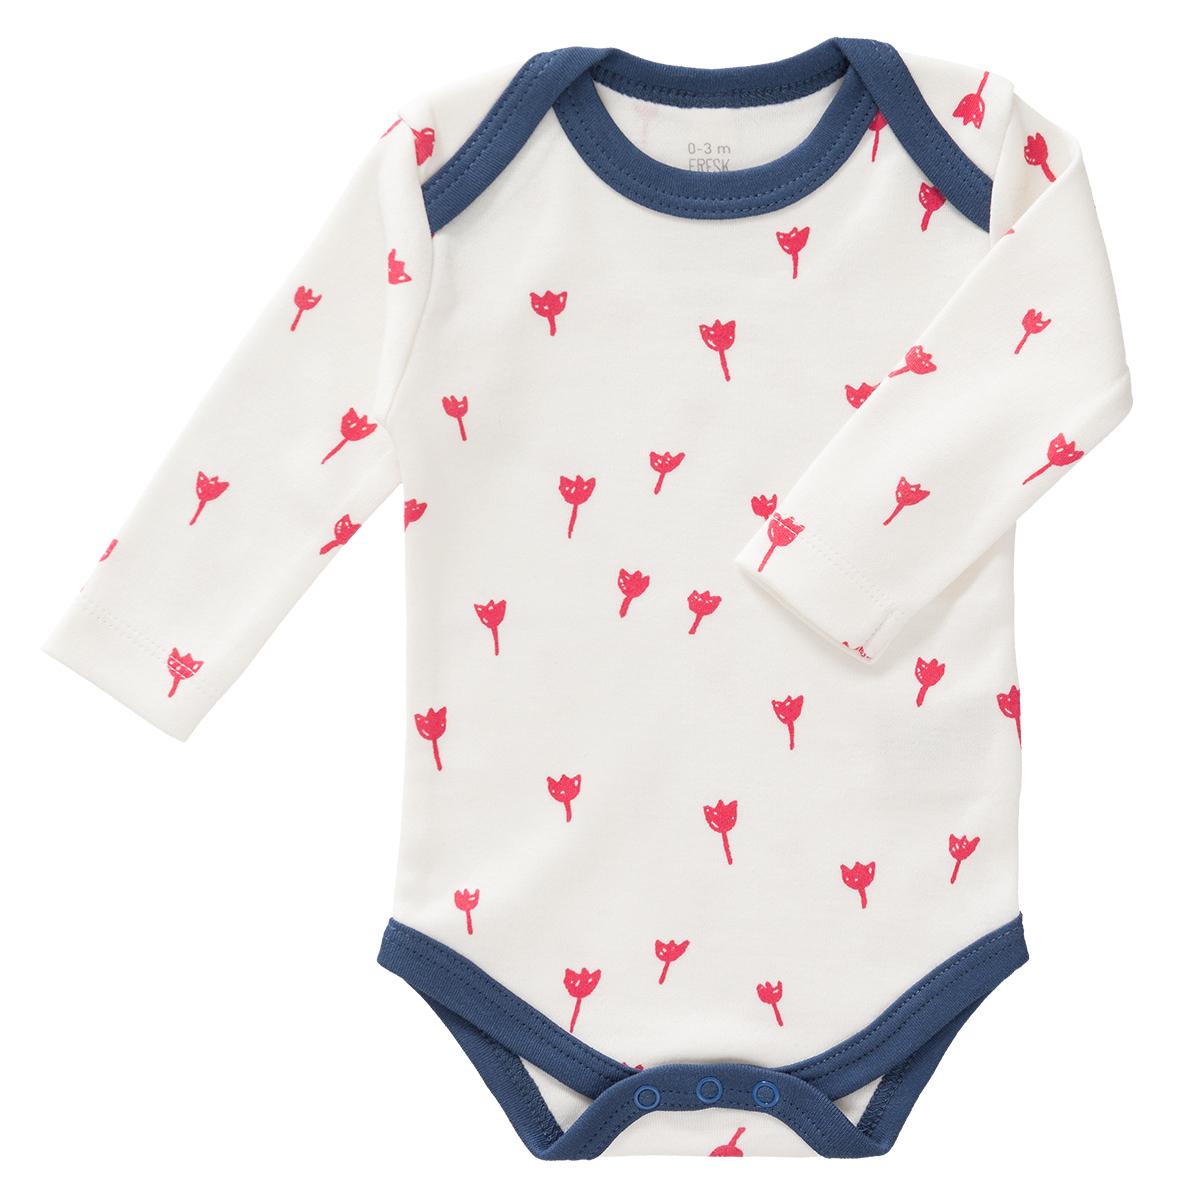 Body & Pyjama Body Manches Longues Tulipes Rouges - 6/12 Mois